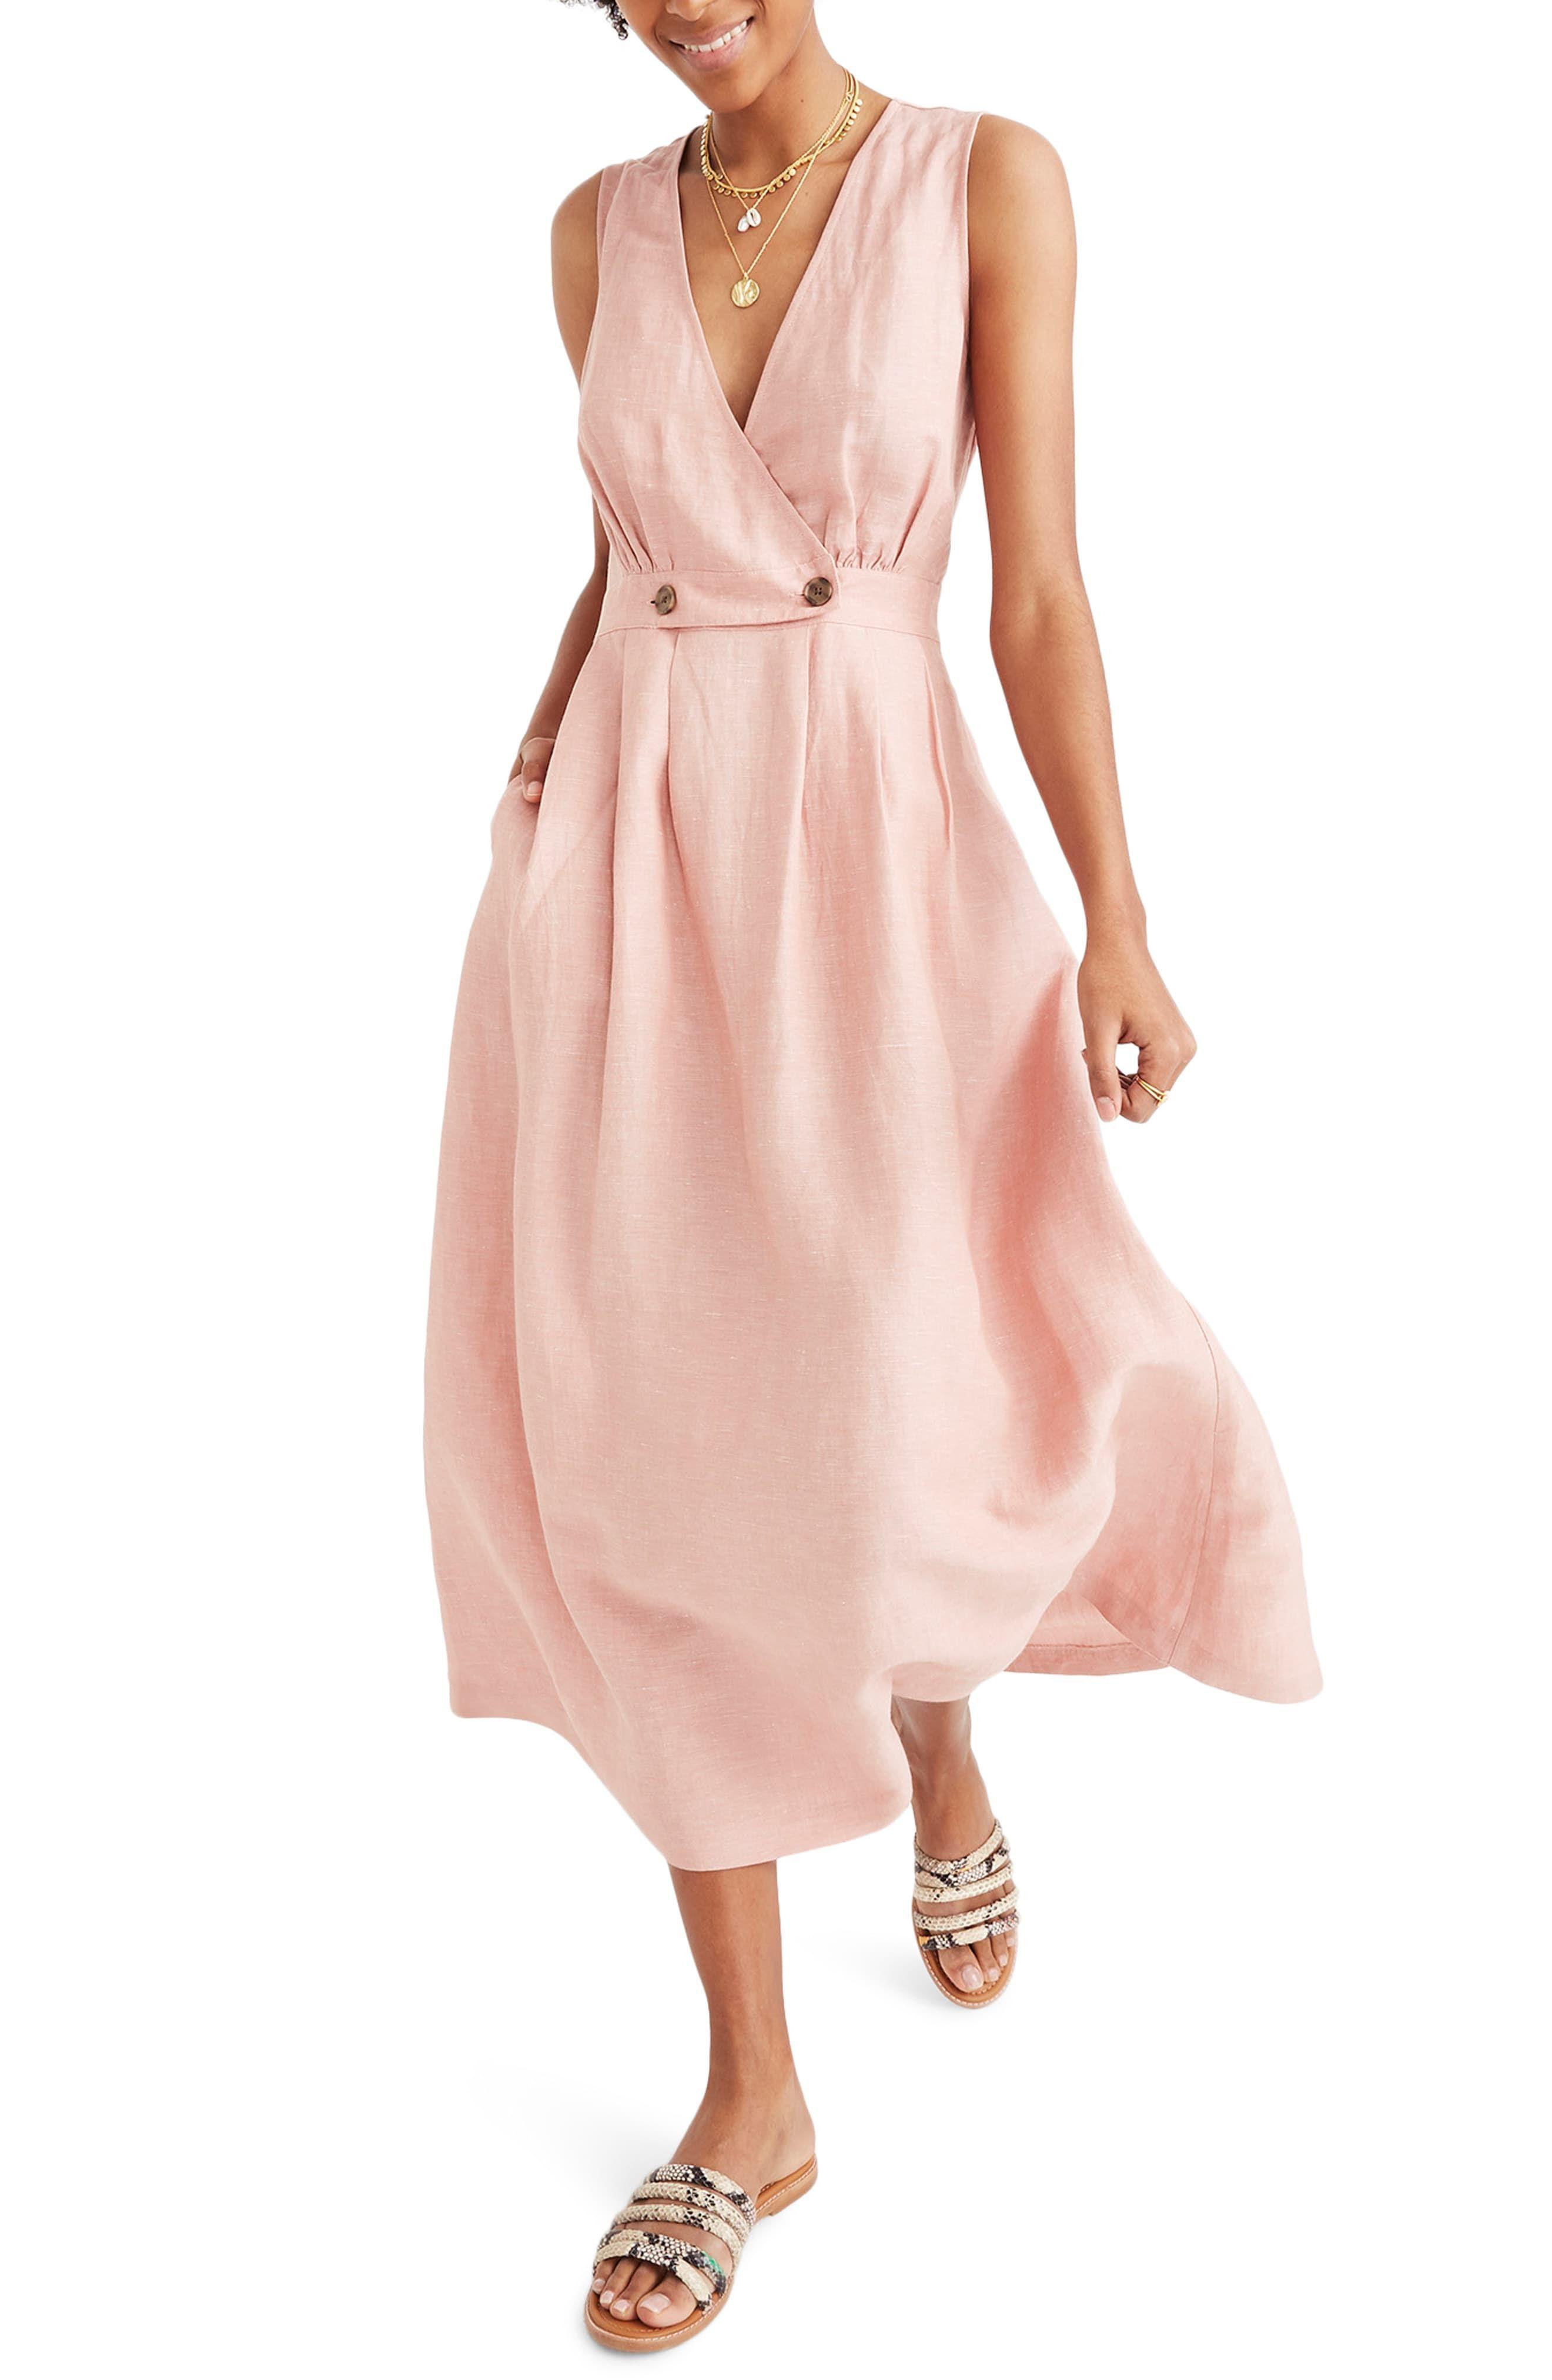 Women S Madewell Button Waist Midi Dress Size 0 Coral Sexydressoutfits Madewell Dresses Midi Dress Online Shopping Fashion Dresses [ 4048 x 2640 Pixel ]